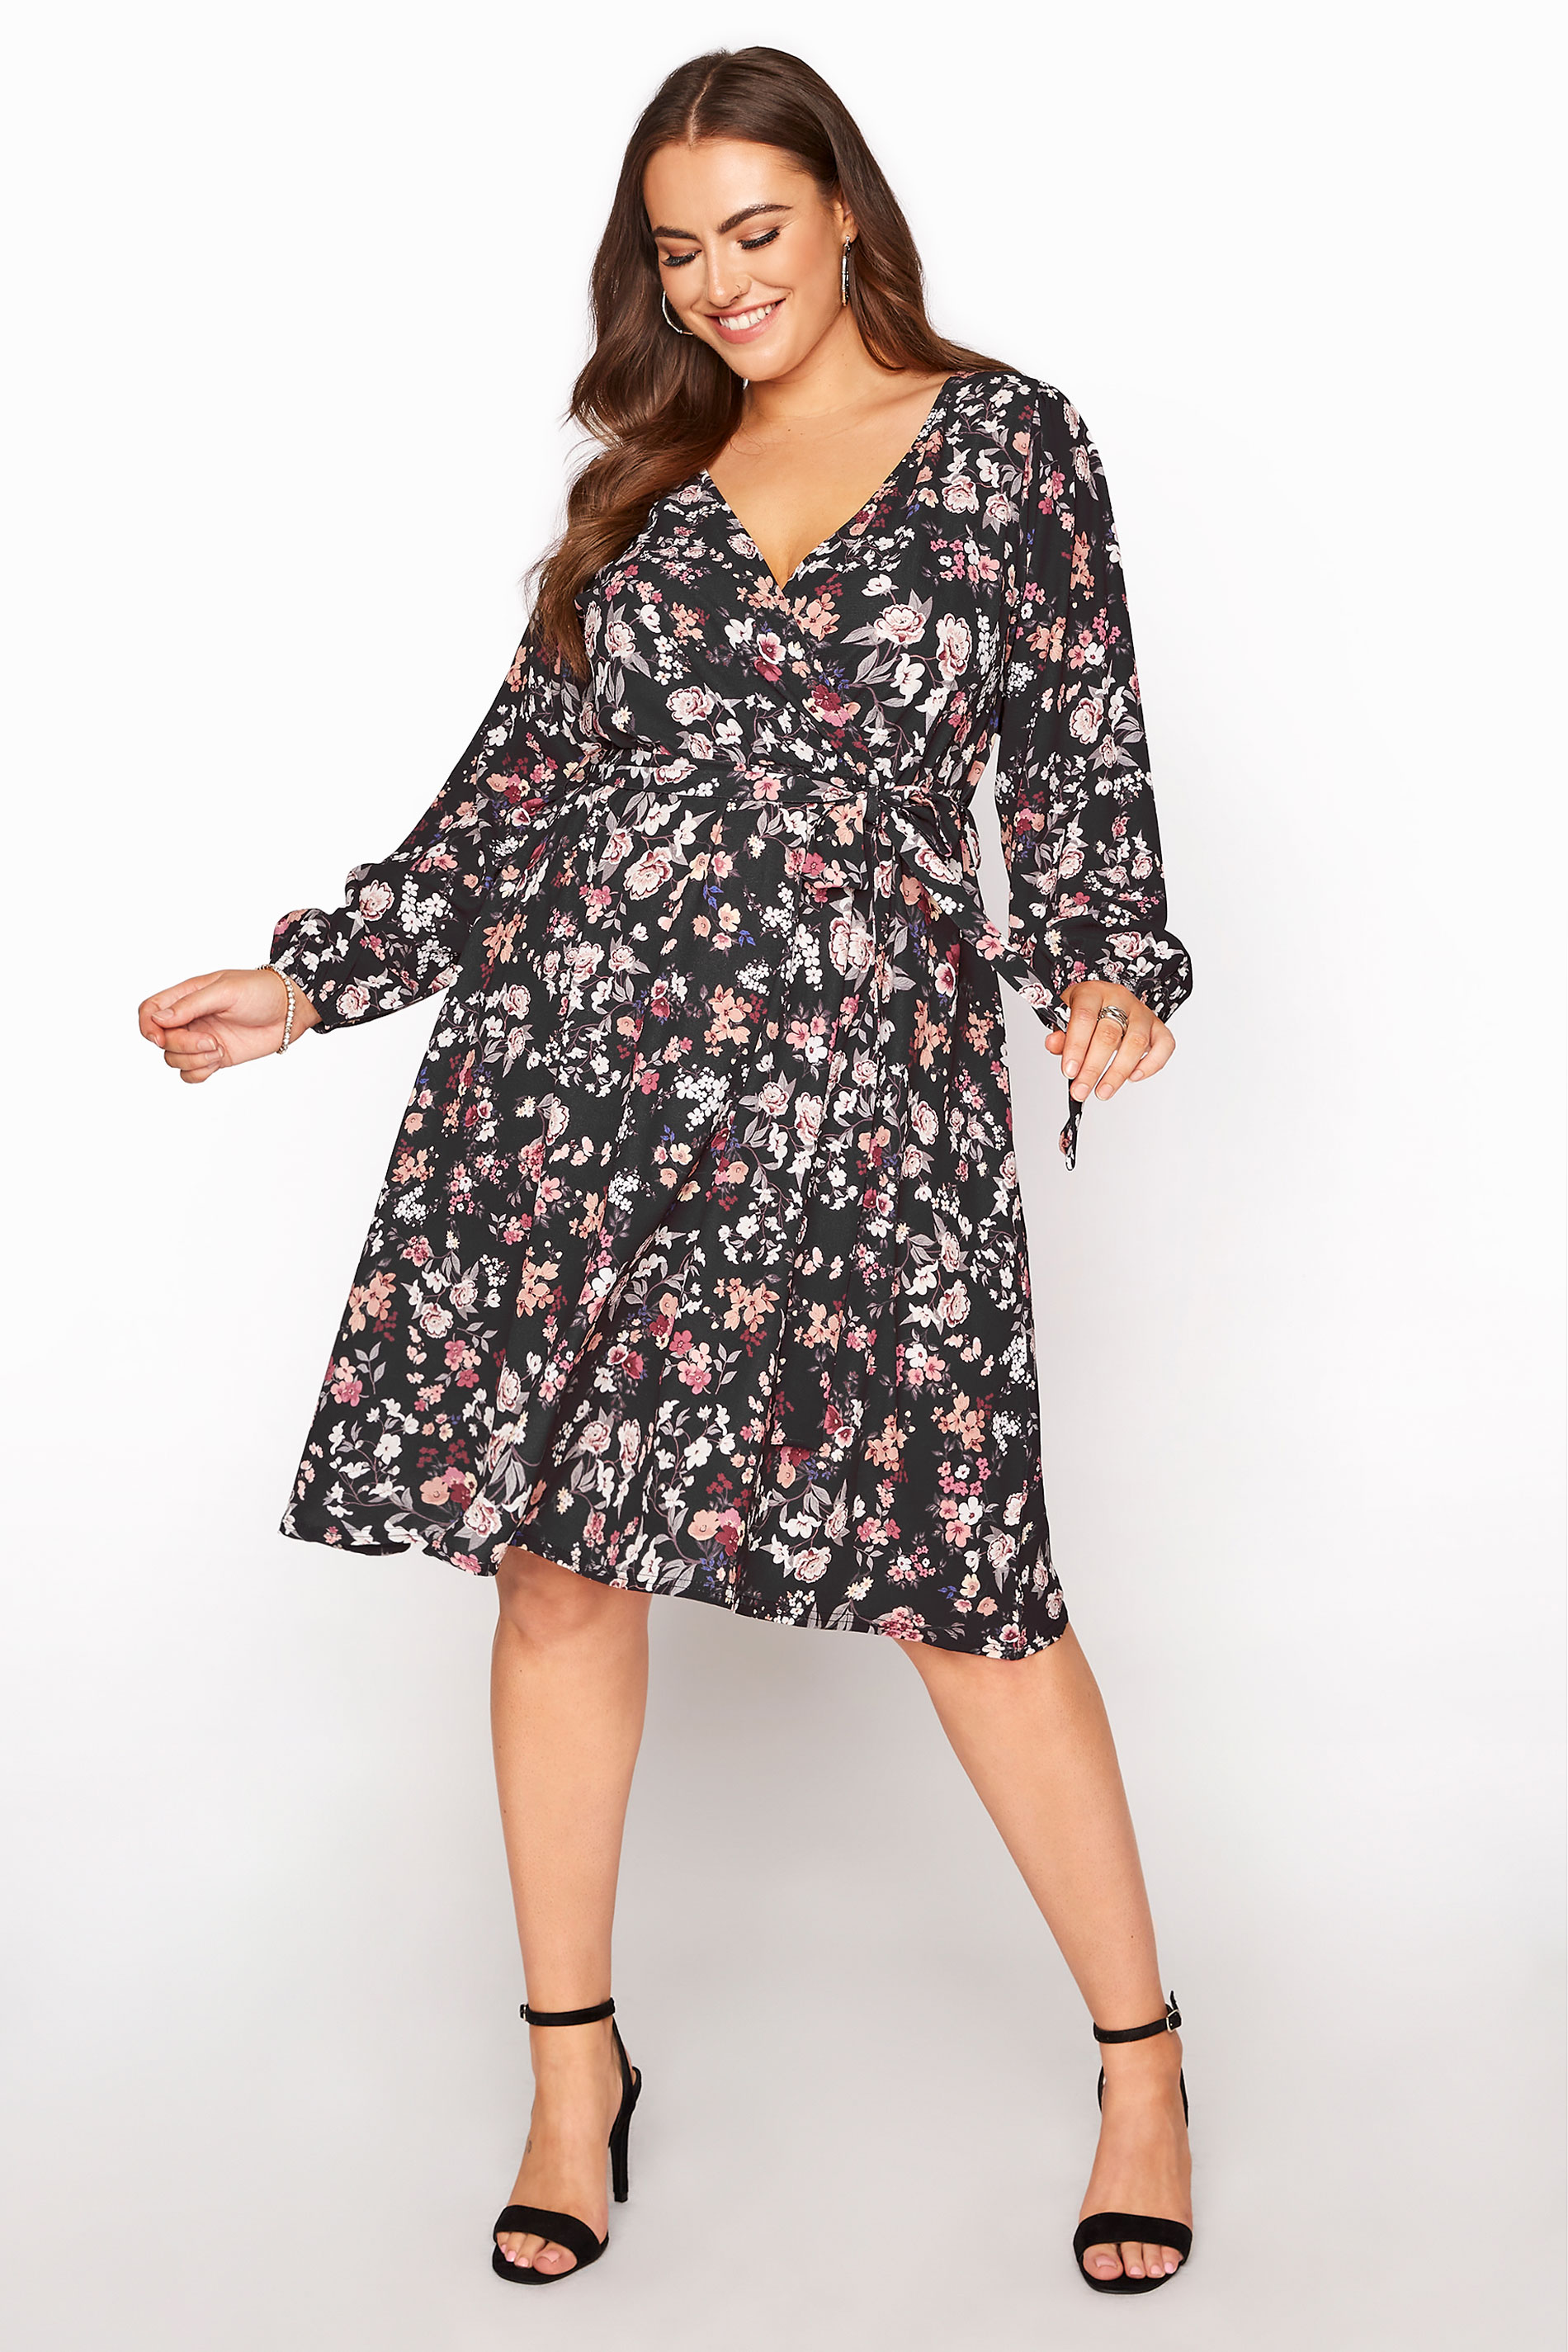 YOURS LONDON Black Floral Wrap Midi Dress_A.jpg